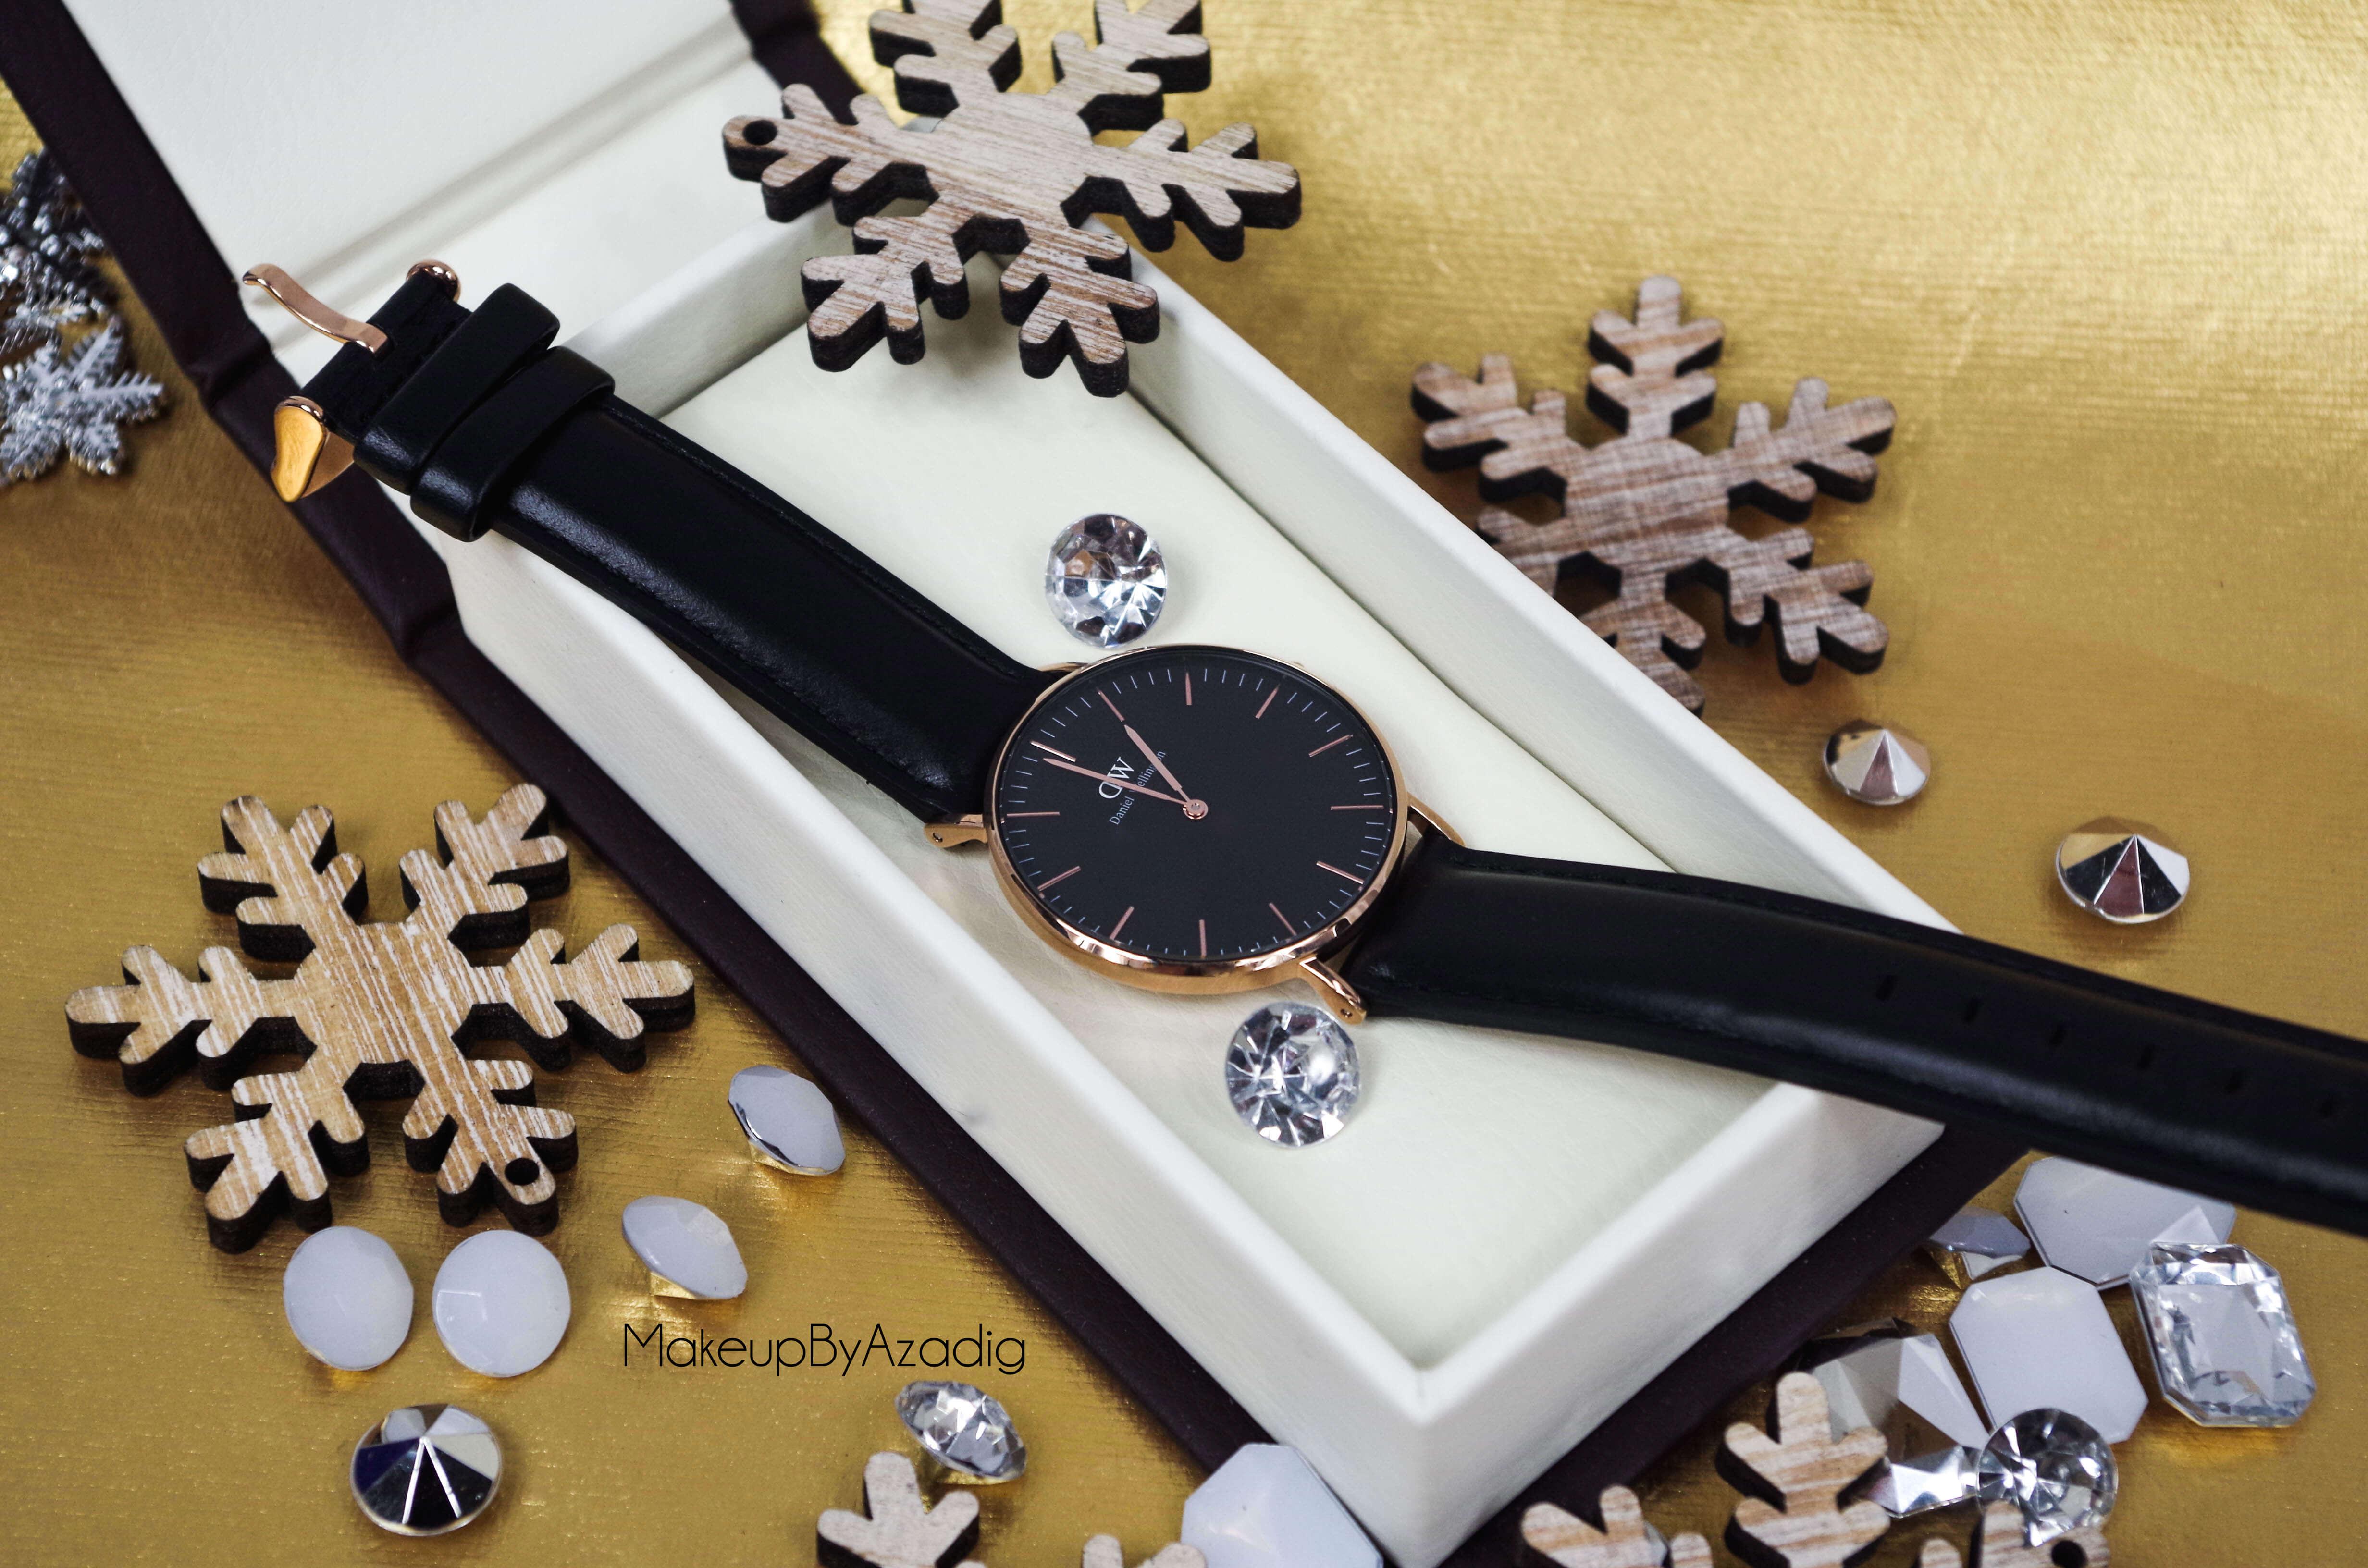 makeupbyazadig-daniel-wellington-montre-classic-black-sheffield-code-promo-troyes-paris-diamond